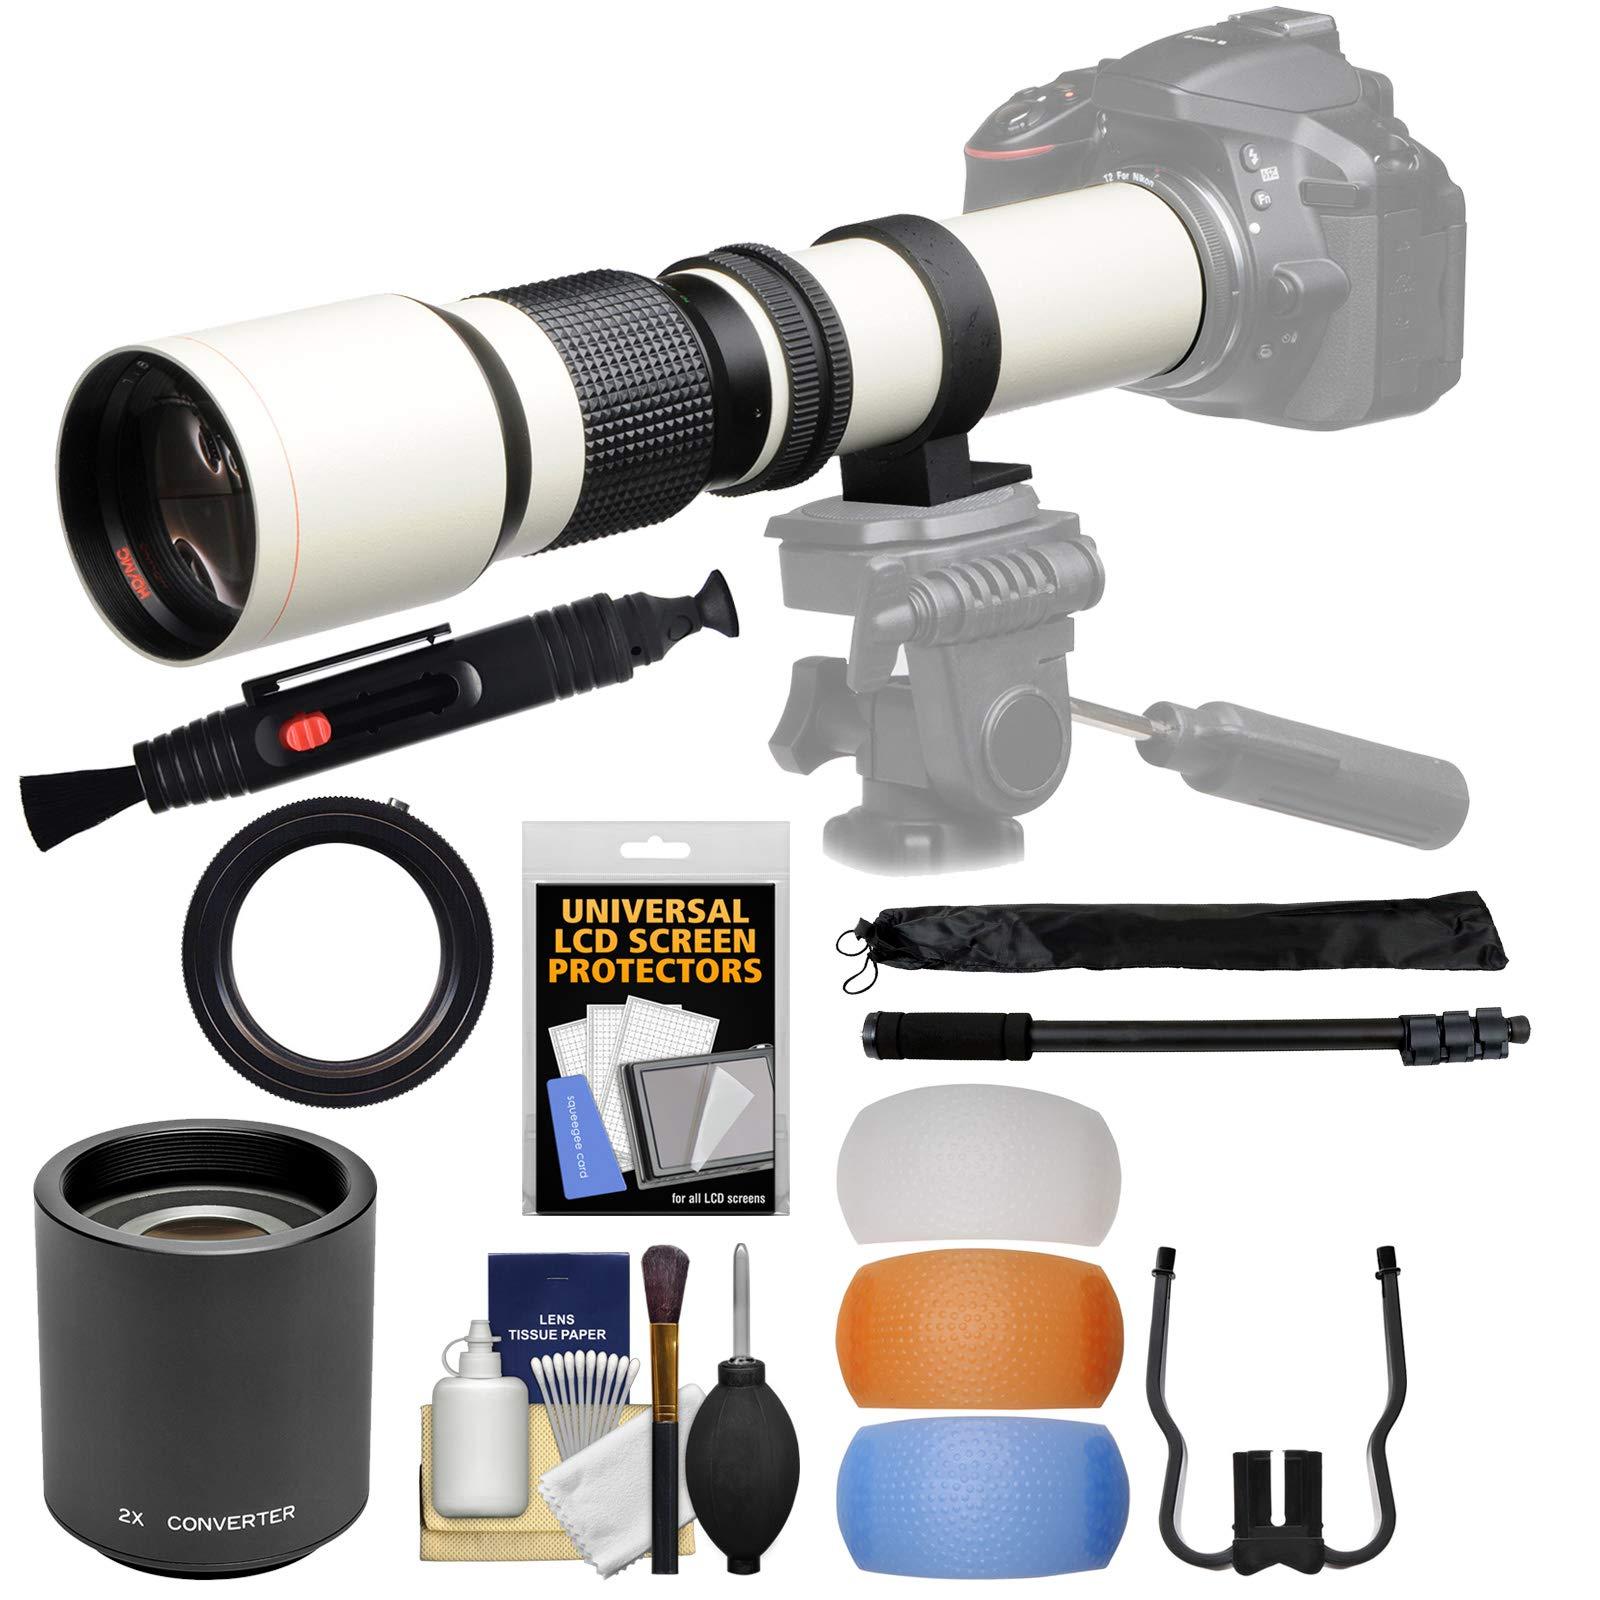 Vivitar 500mm f//8.0 Telephoto Lens with 2X Teleconverter D3300 + Tripod D5500 D7200 Camera 3 Filters Kit for Nikon D3200 =1000mm D7100 D5300